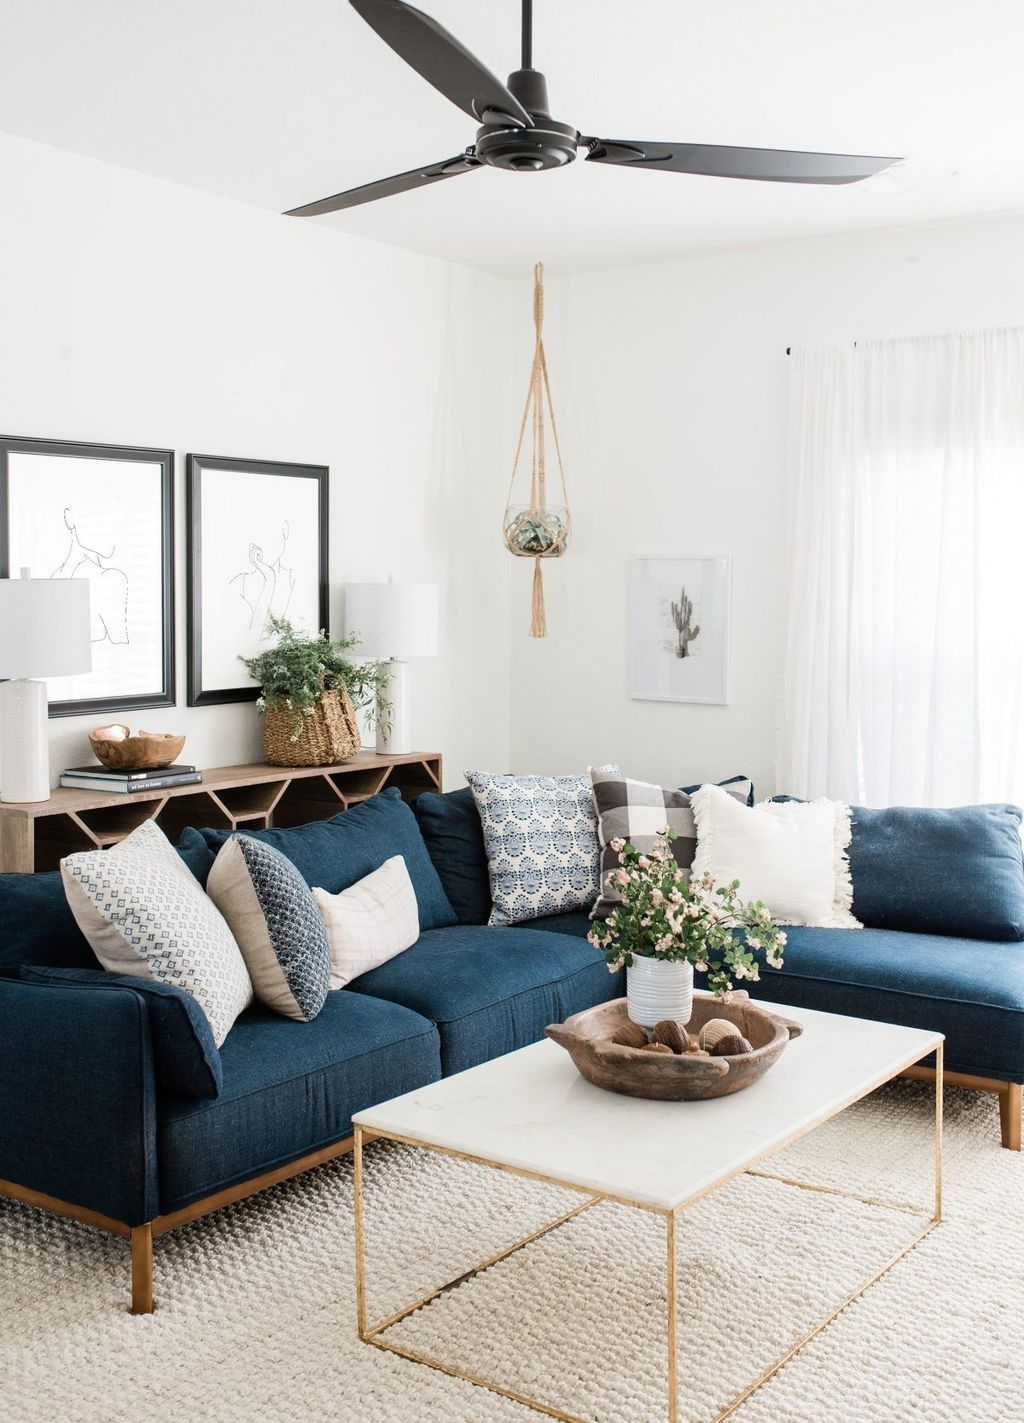 40 Vintage Blue Living Room Design Ideas You Must Have 6 In 2020 Modern Boho Living Room Living Room Decor Apartment Living Room White